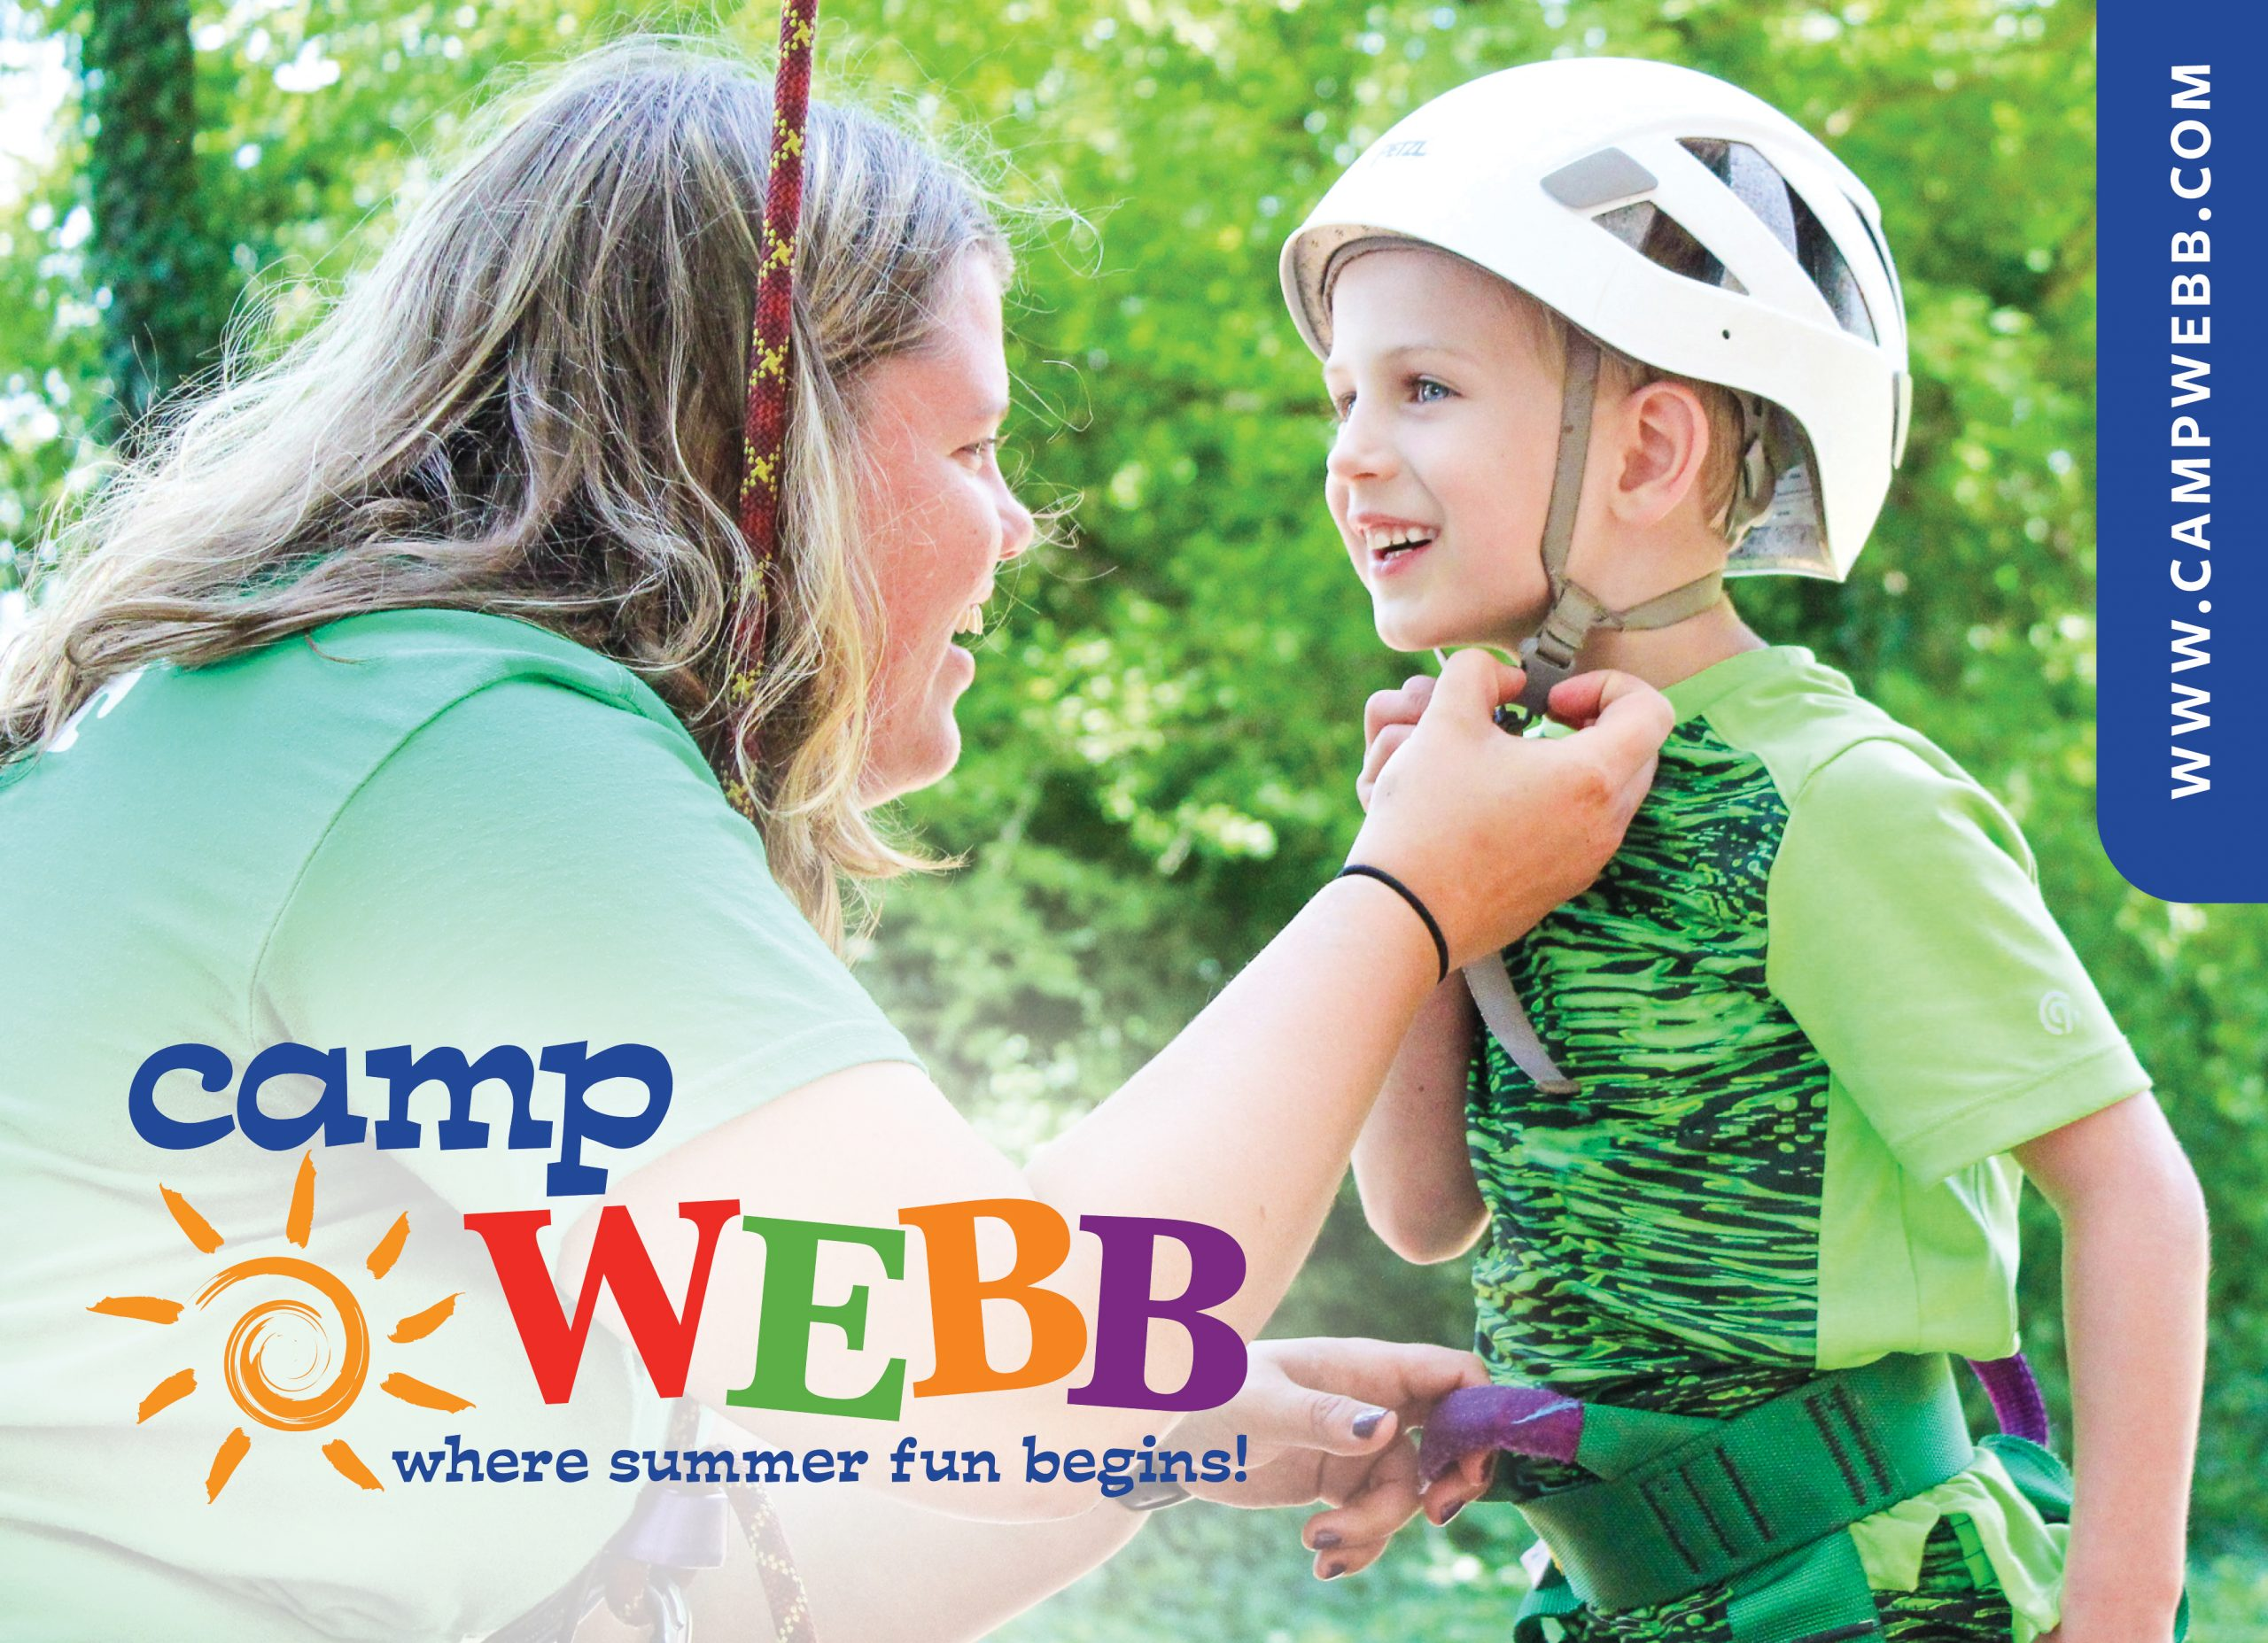 Camp Webb